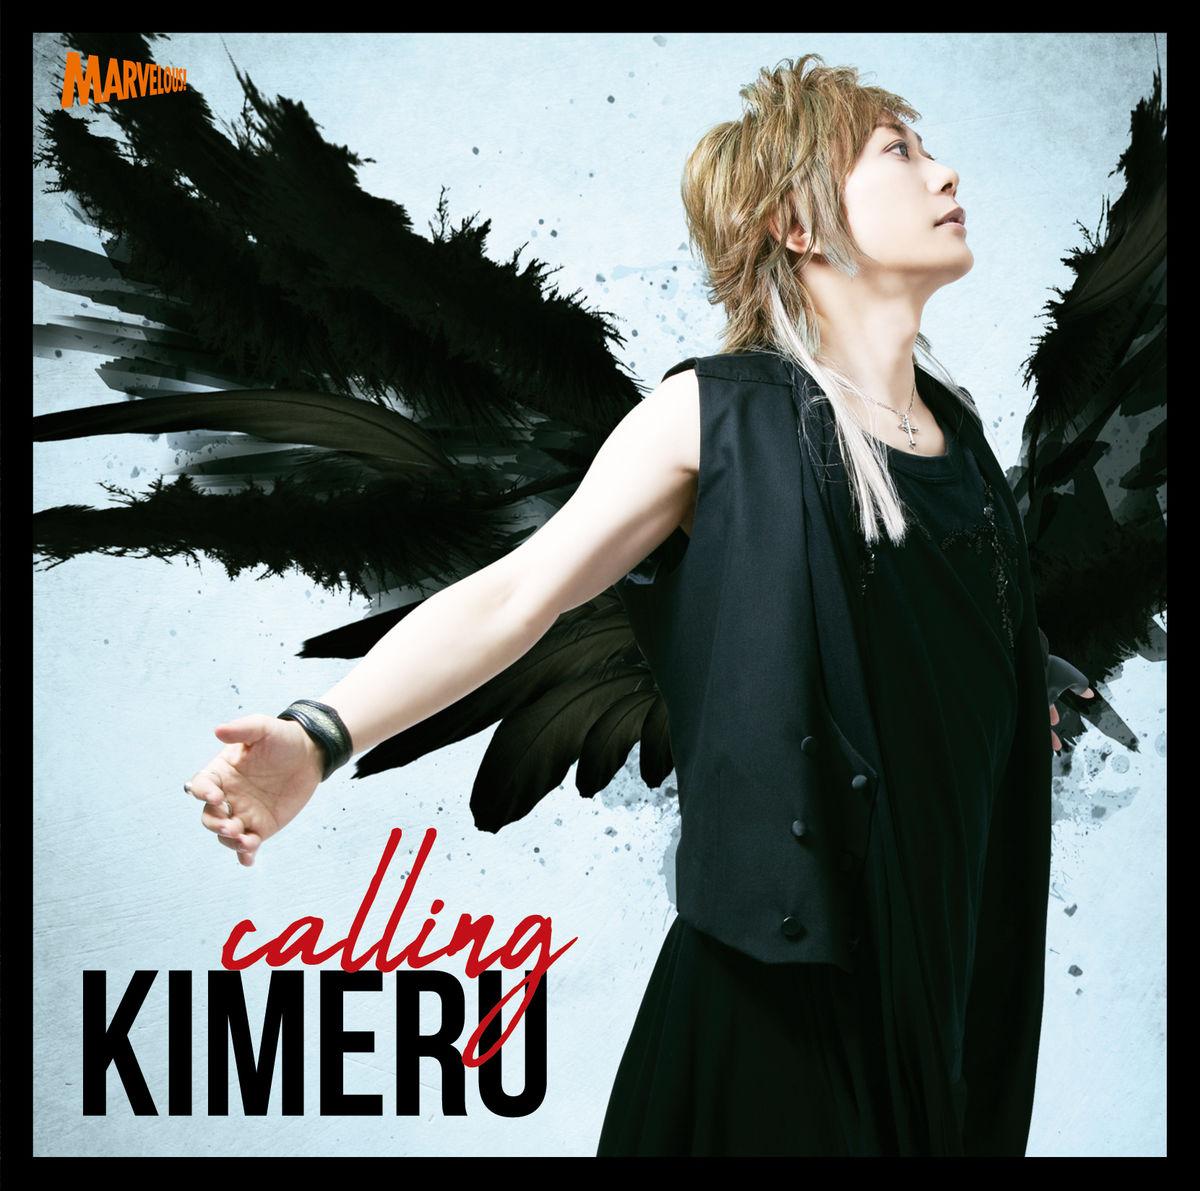 『Kimerucalling』収録の『calling』ジャケット